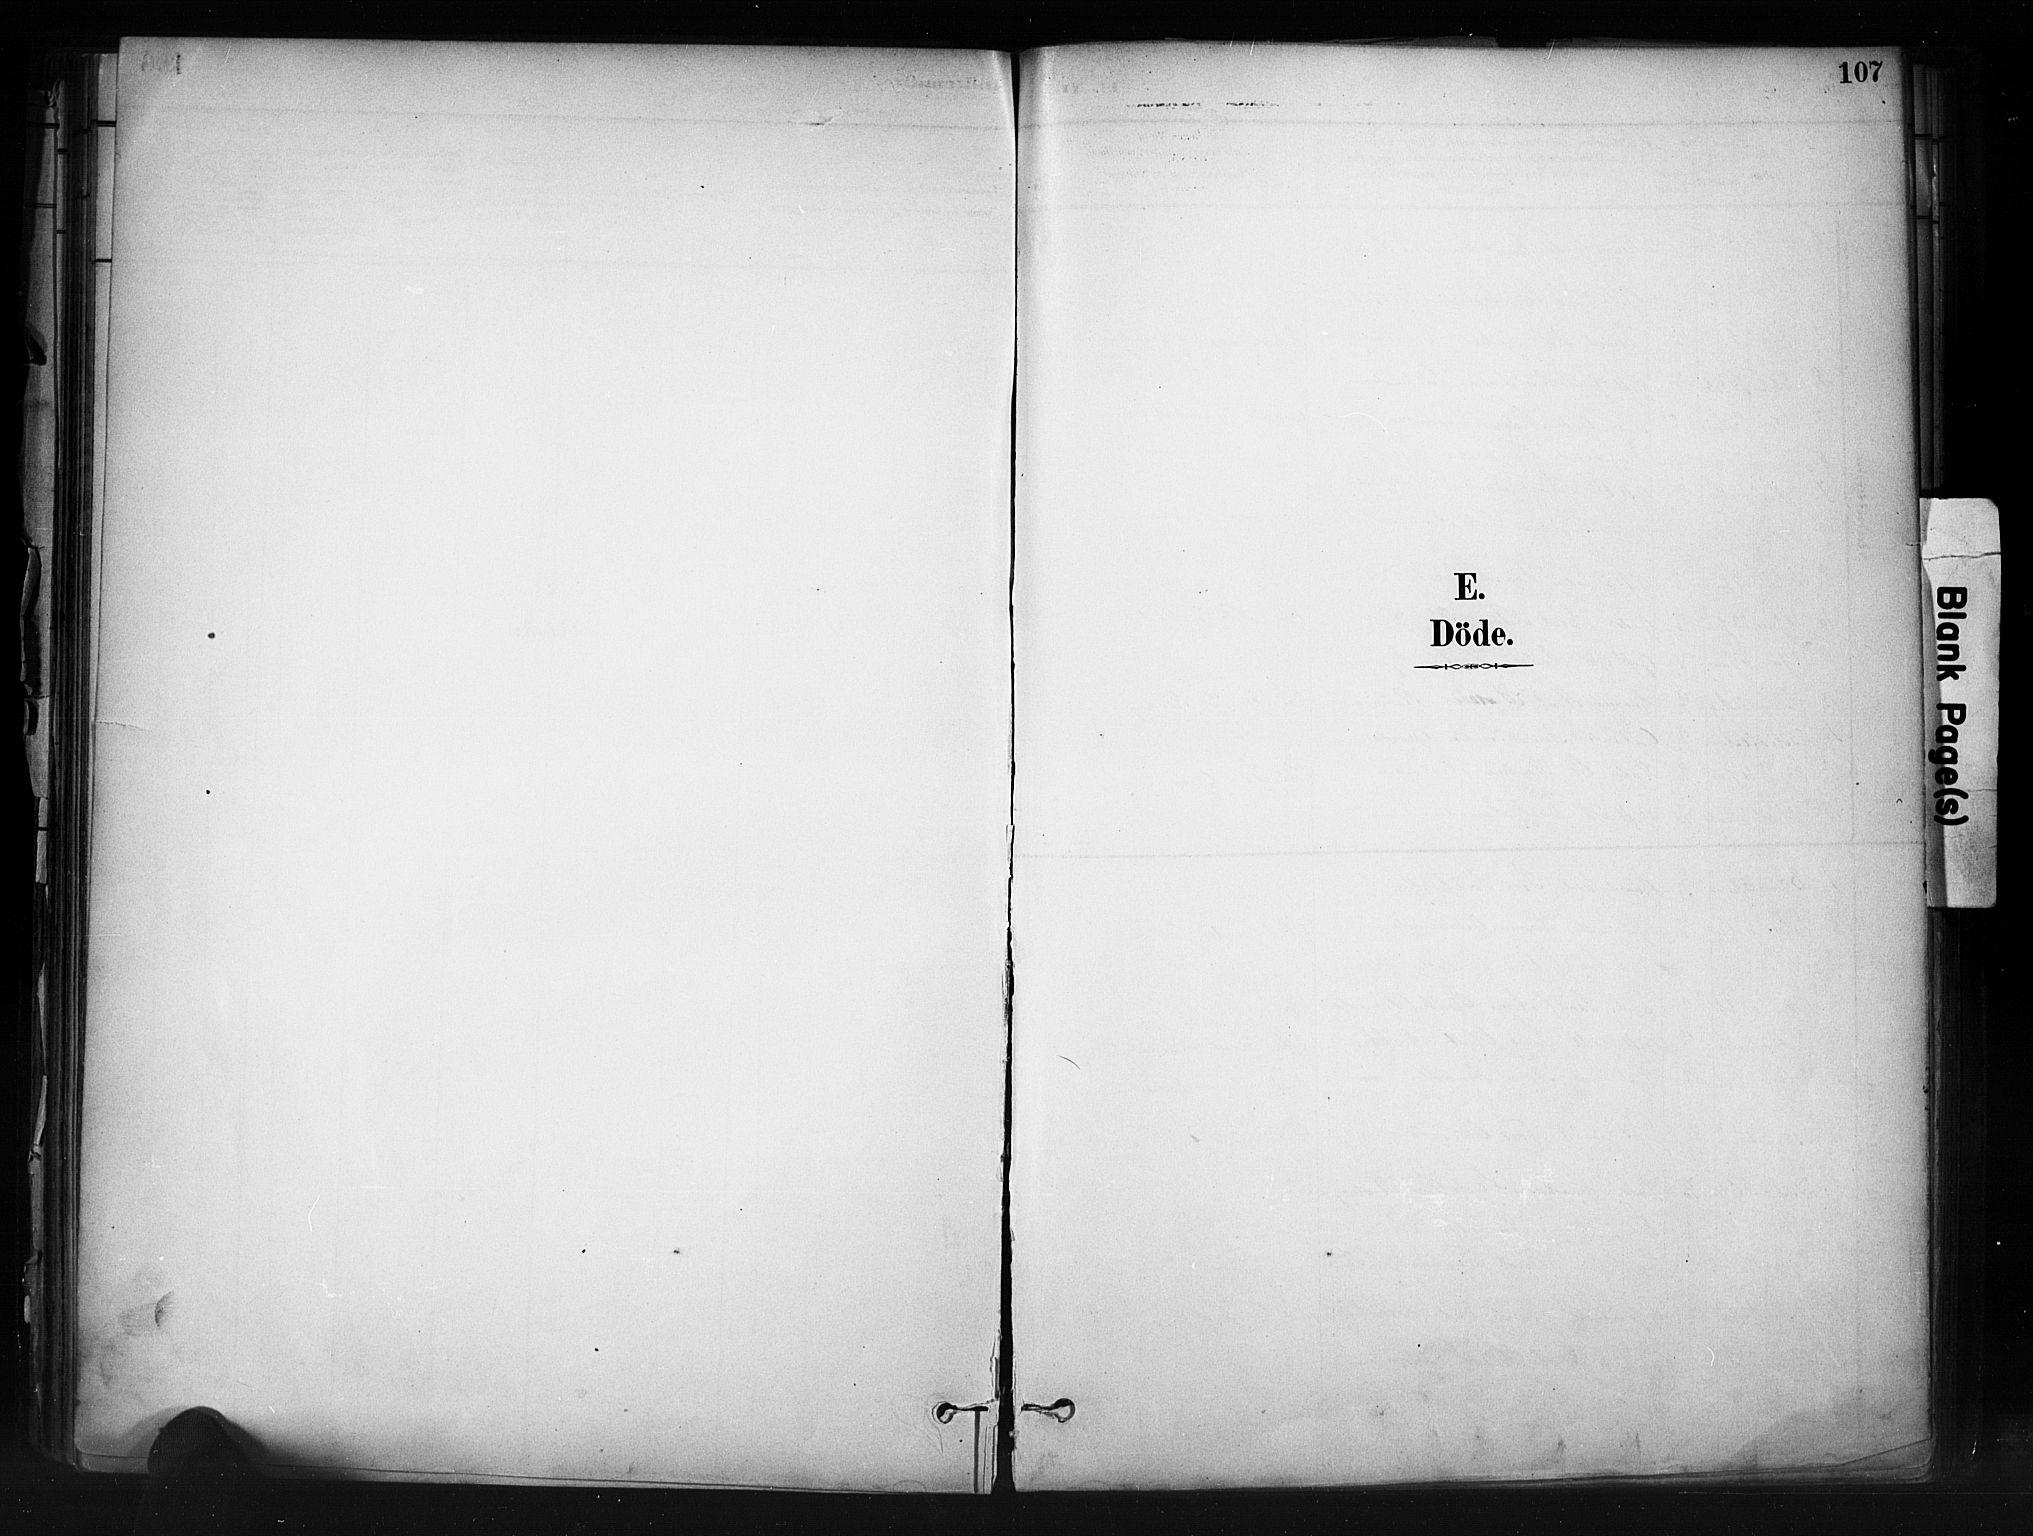 SAH, Nord-Aurdal prestekontor, Ministerialbok nr. 13, 1883-1895, s. 107